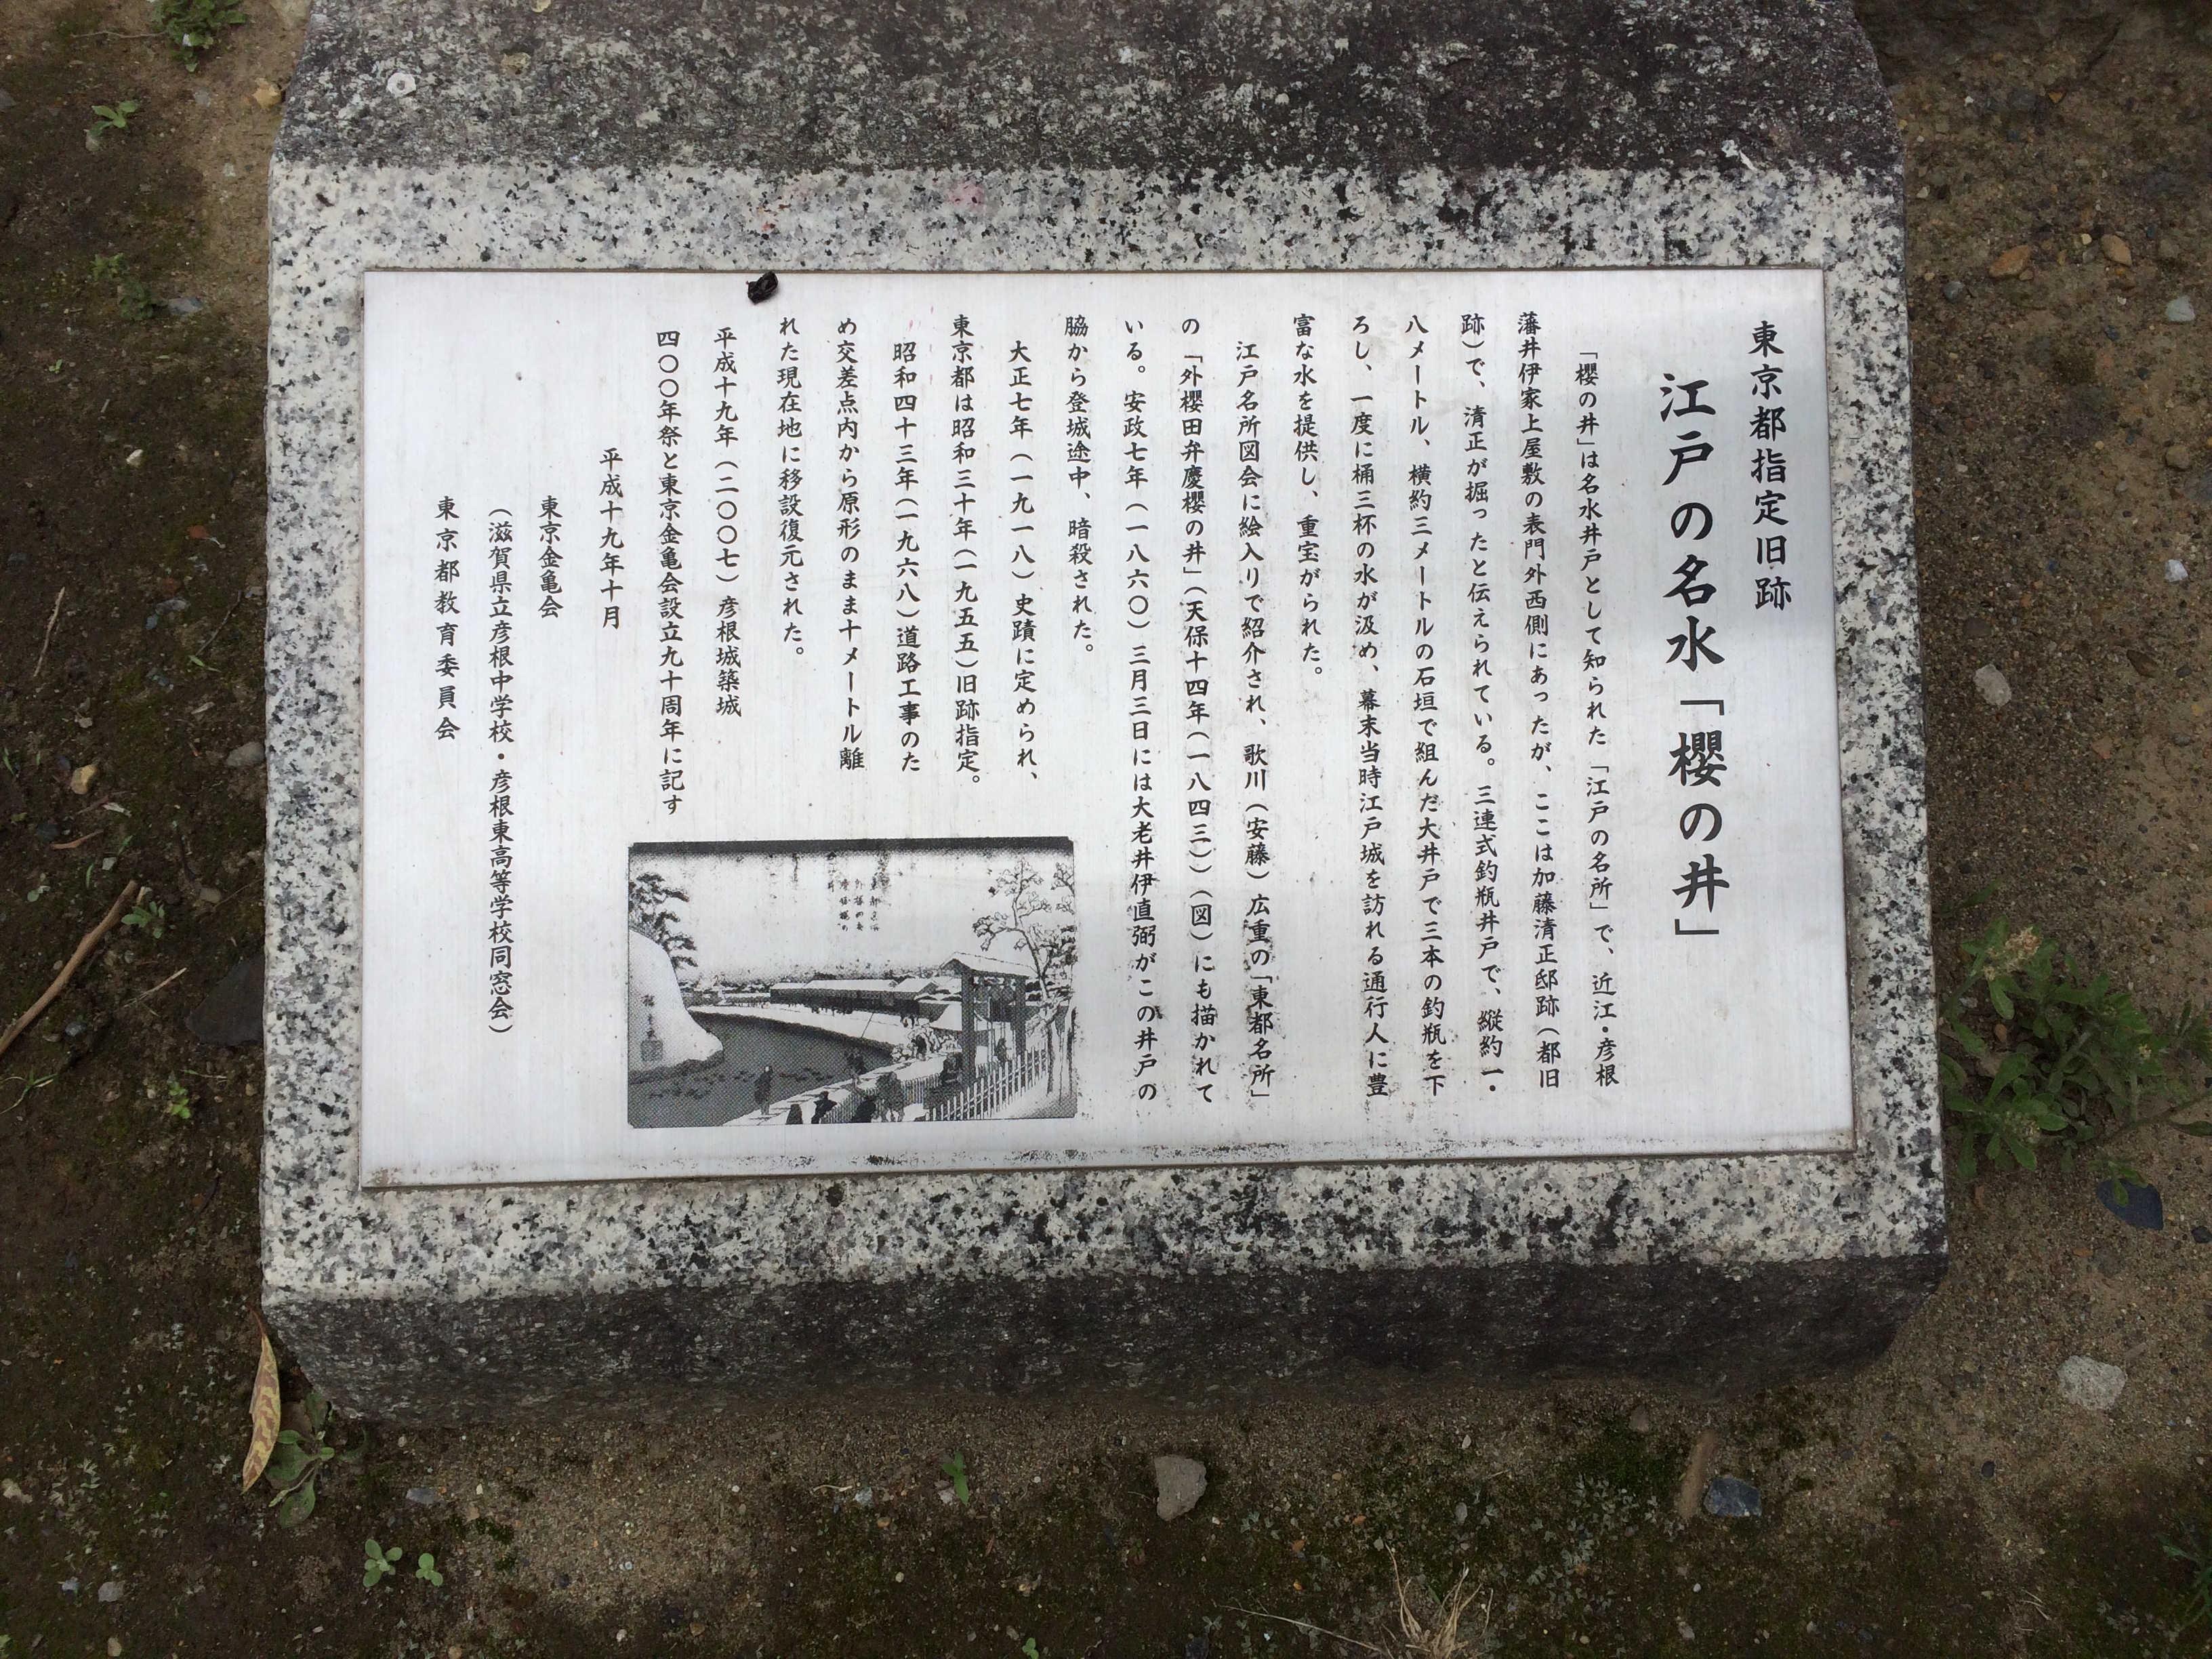 江戸の名水『櫻の井』井伊掃部頭邸跡